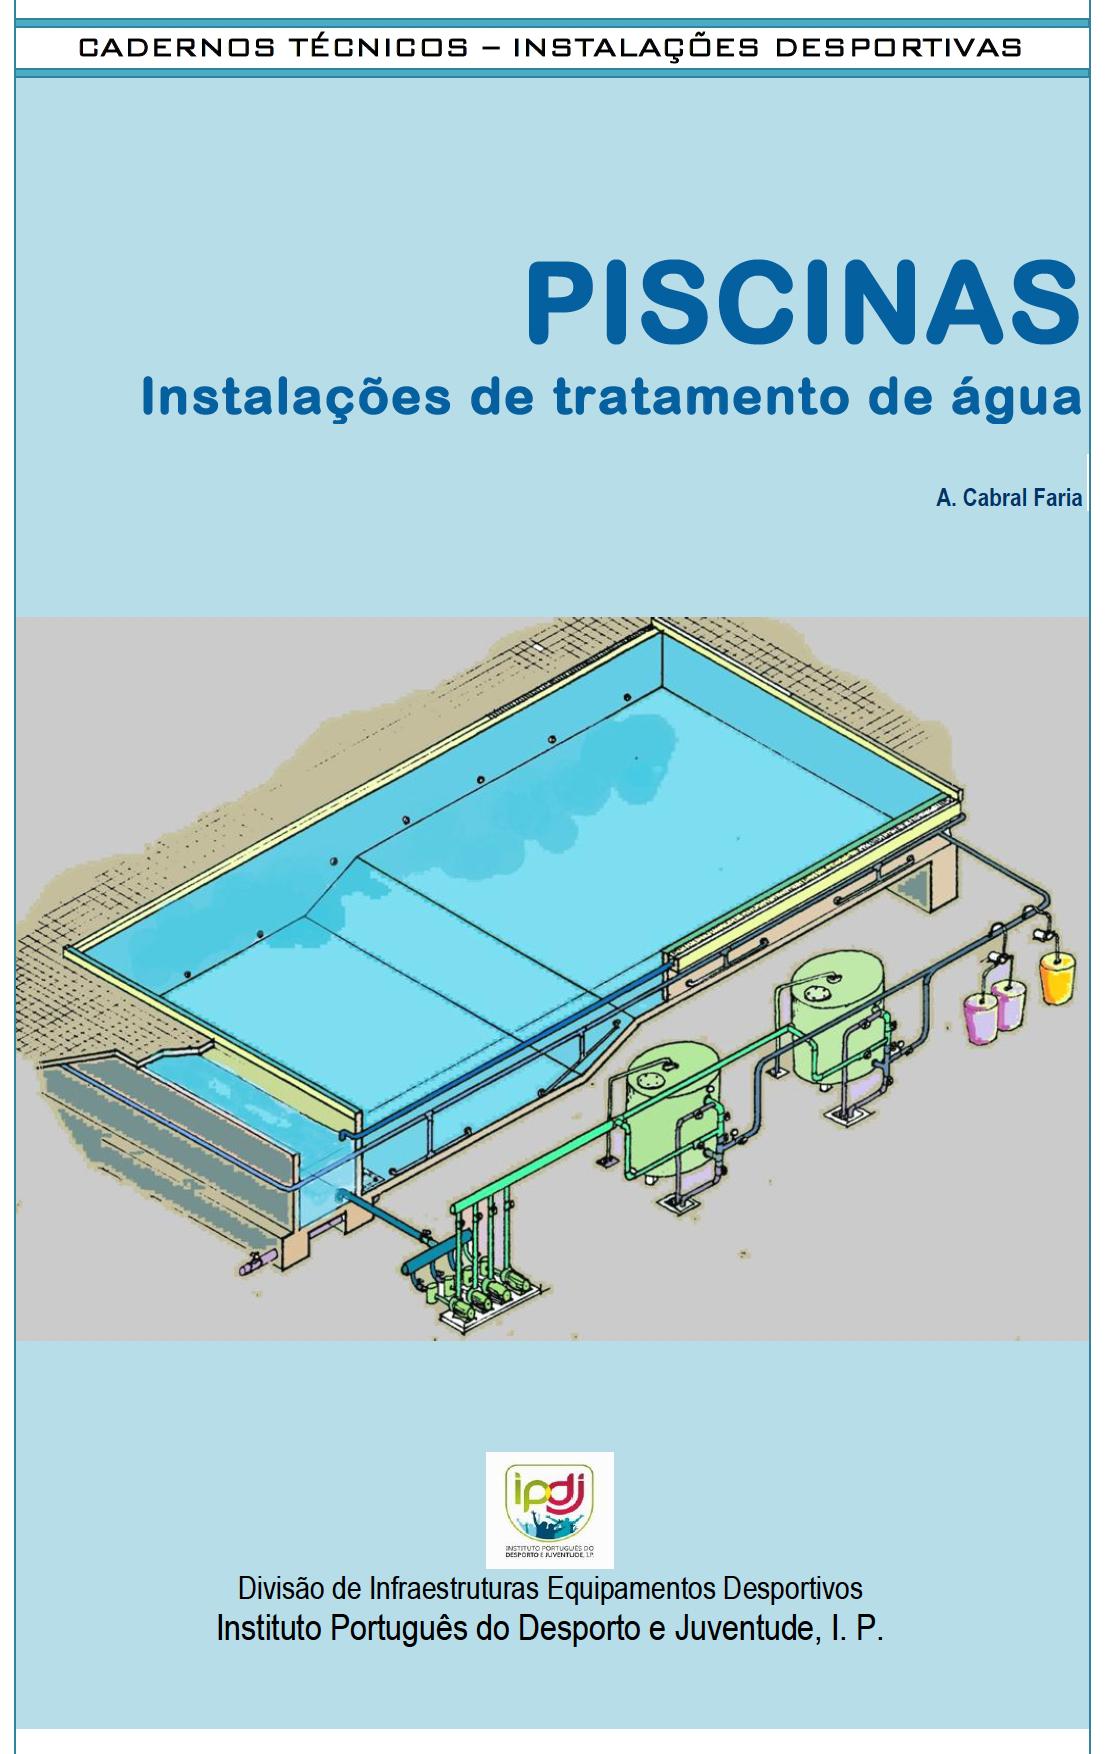 Piscinas Instalacoes de tratamento de agua